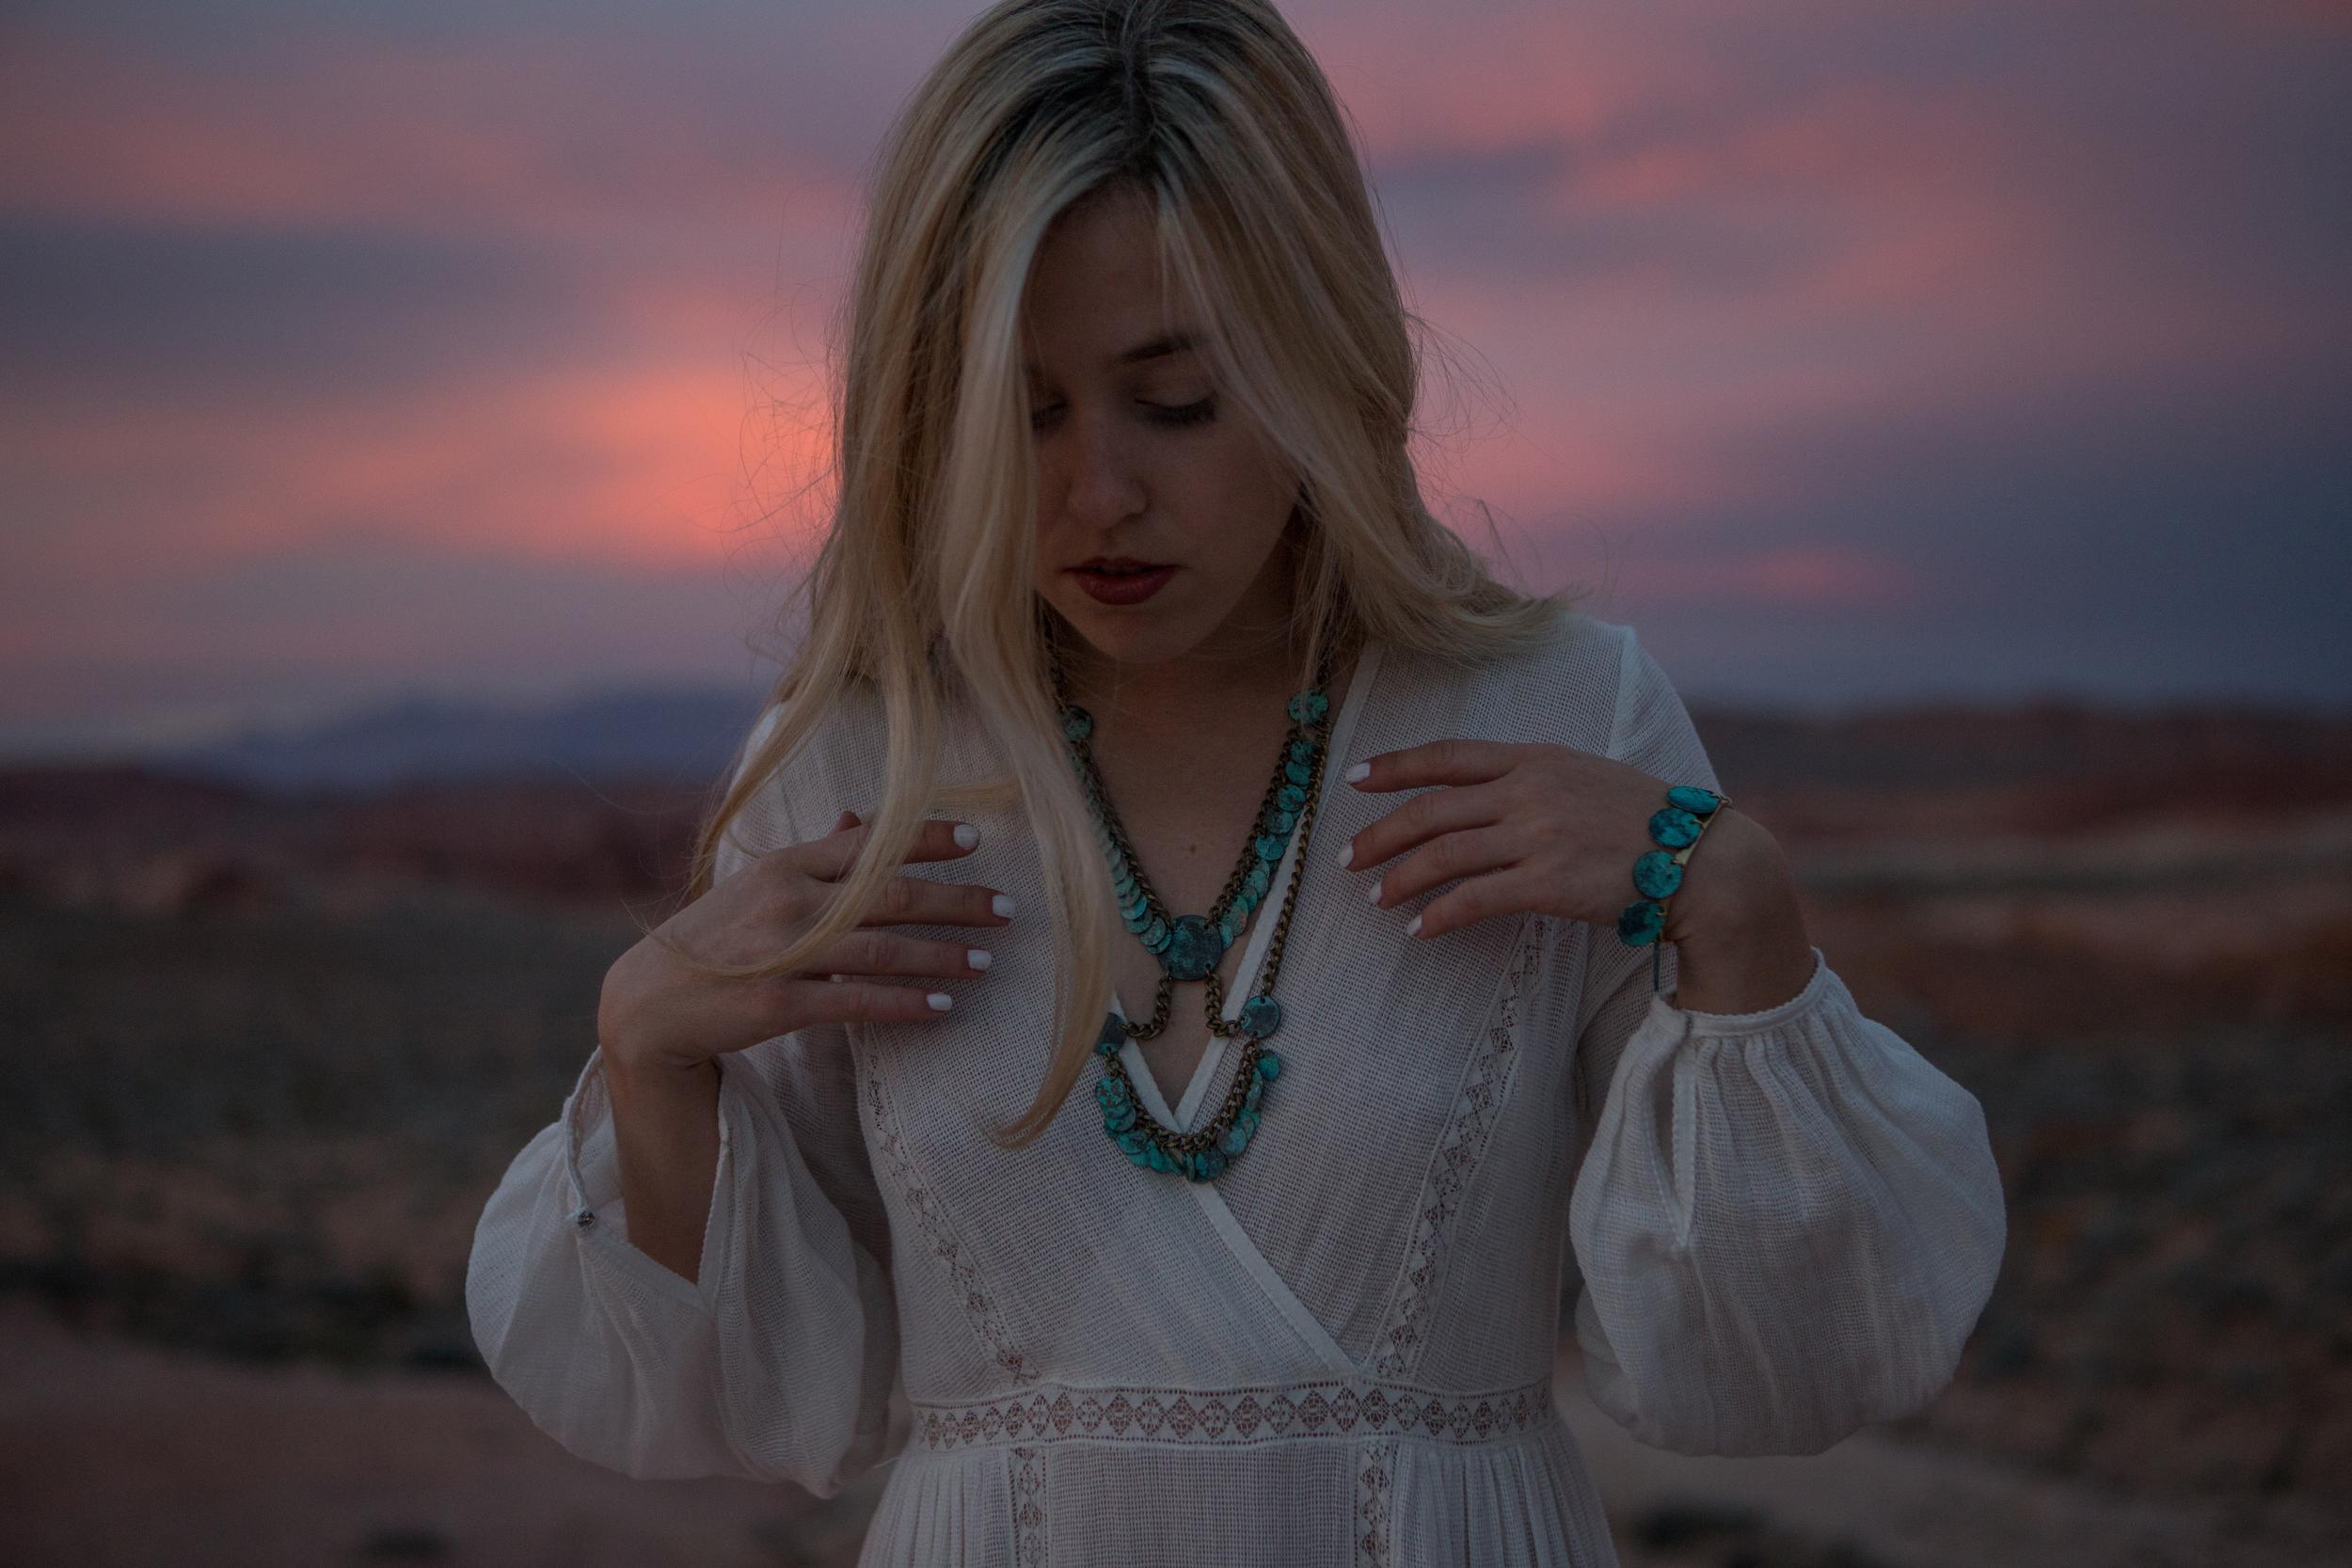 AstroBandit_ValleyOfFire_Sunset_WhiteDress_Dancing_Fashon_9.jpg